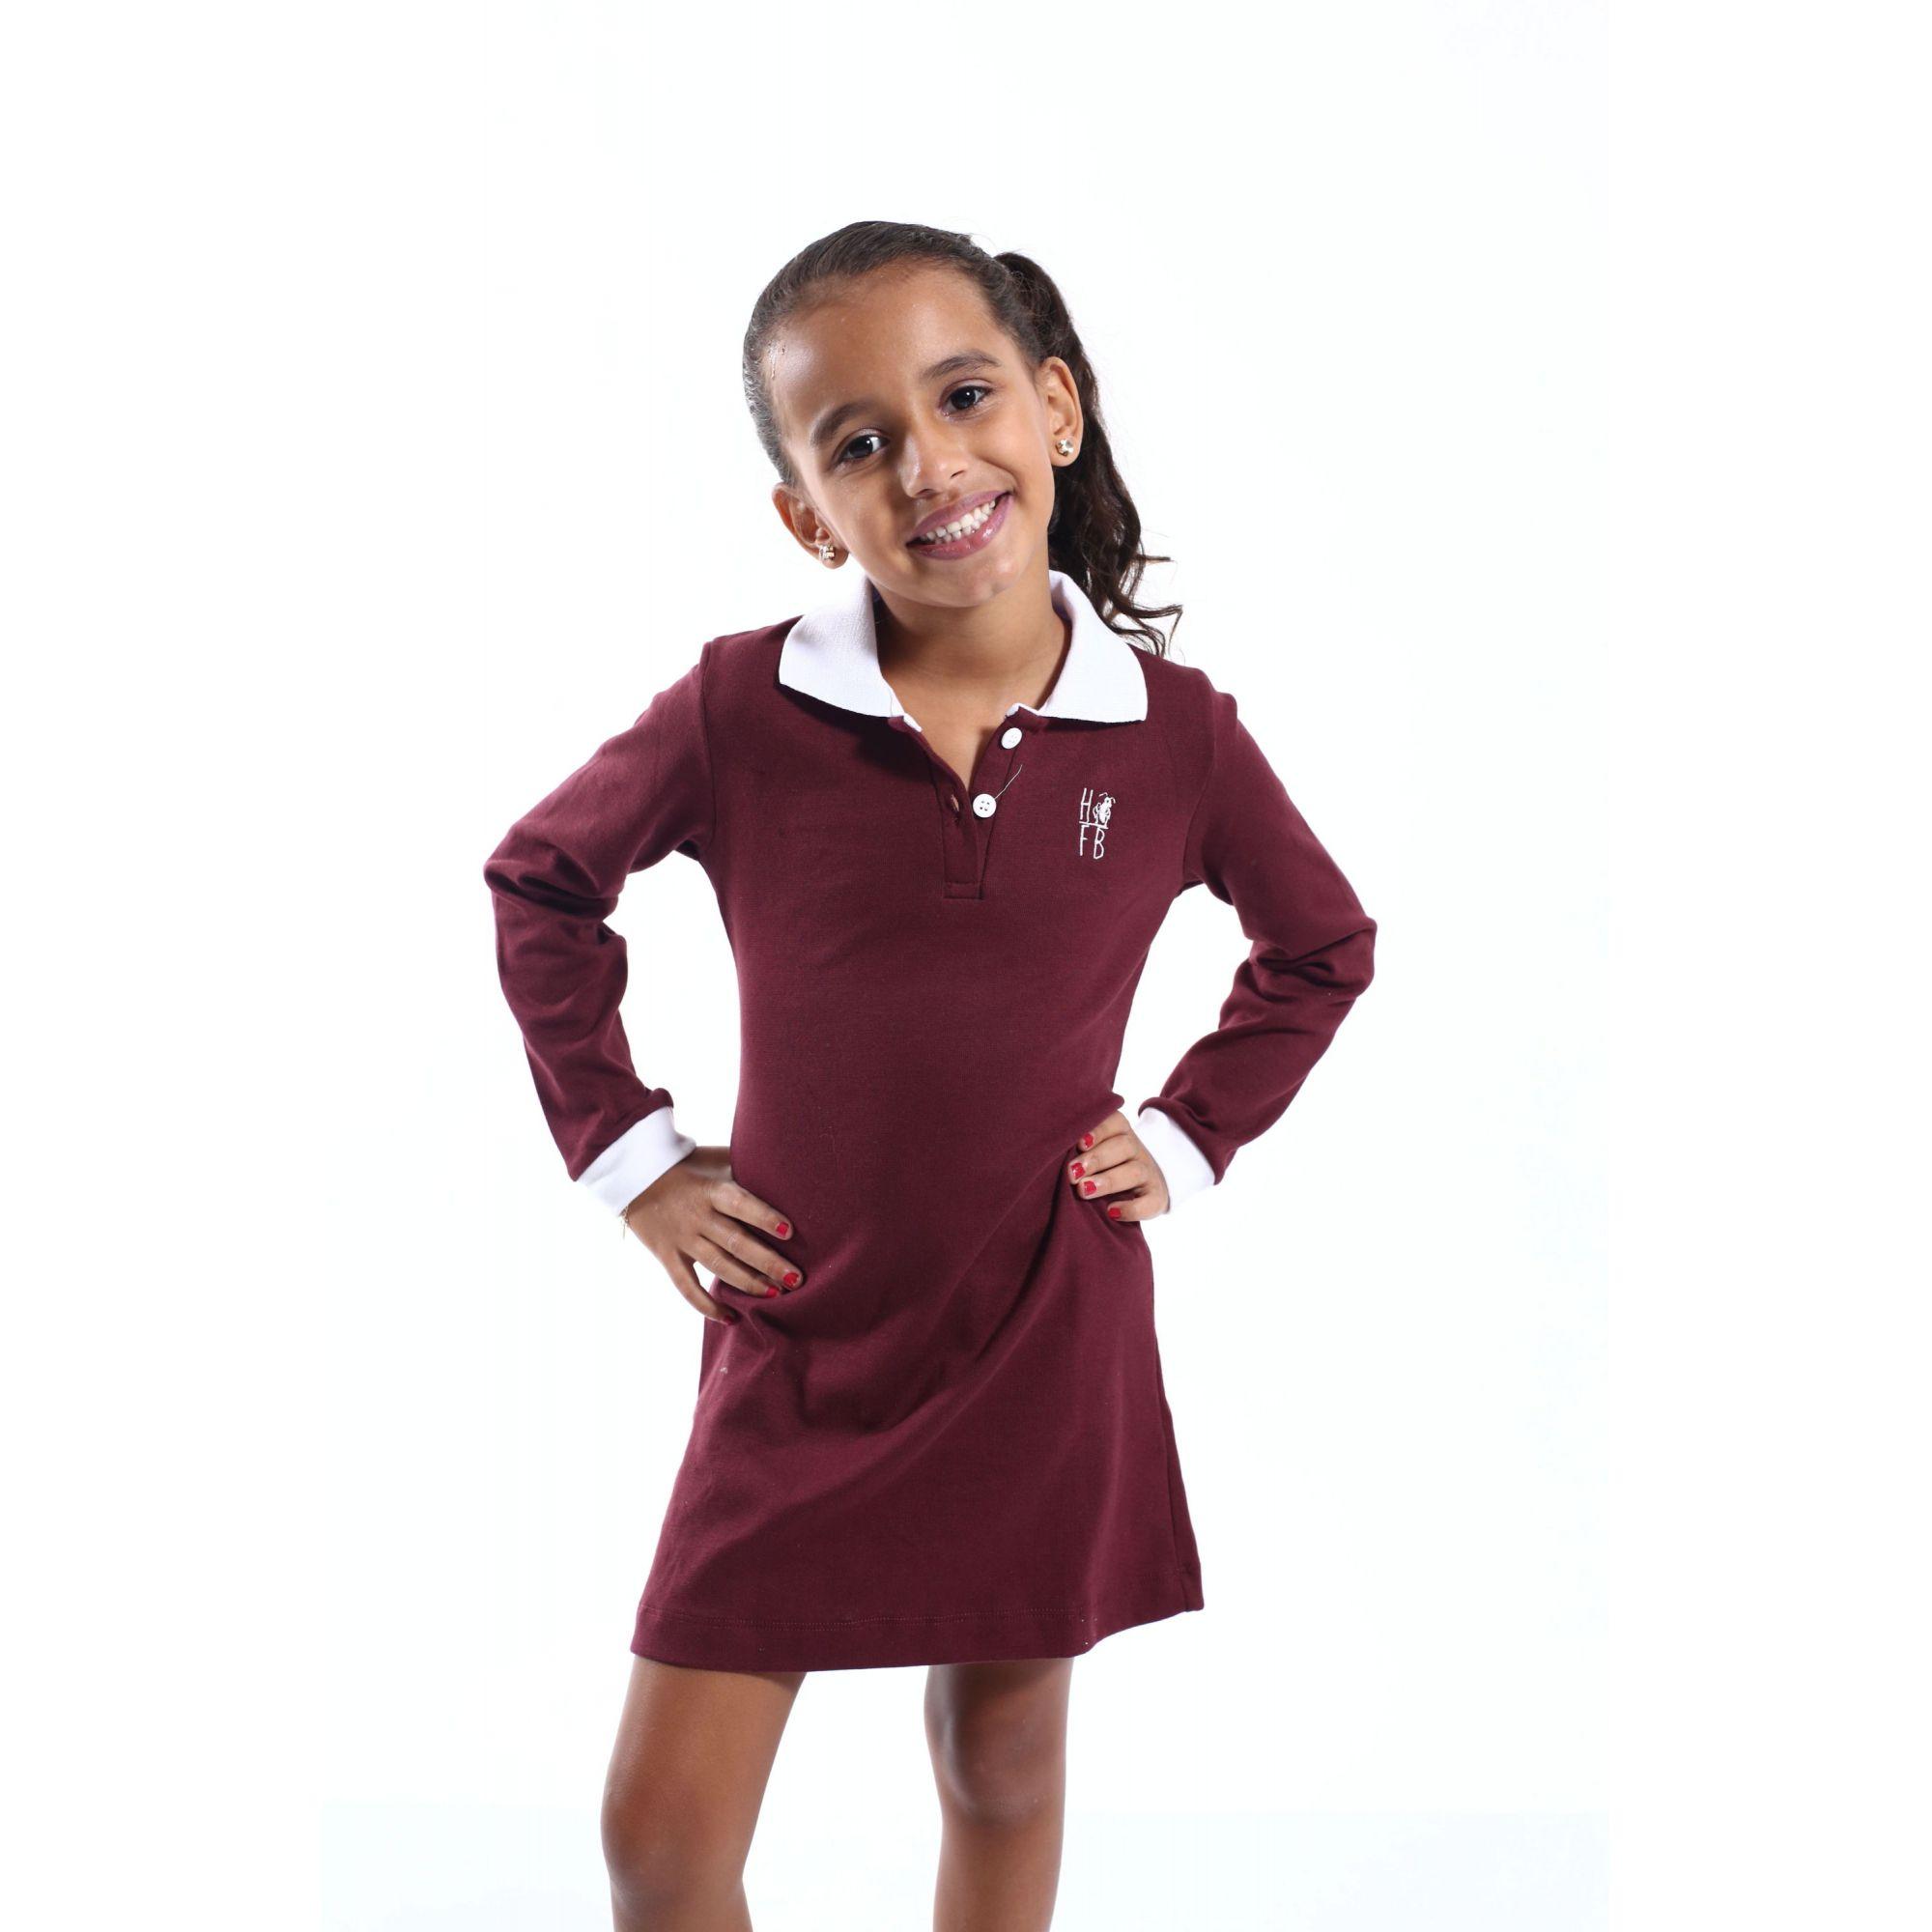 Vestido Infantil Manga Longa Vinho  - Heitor Fashion Brazil